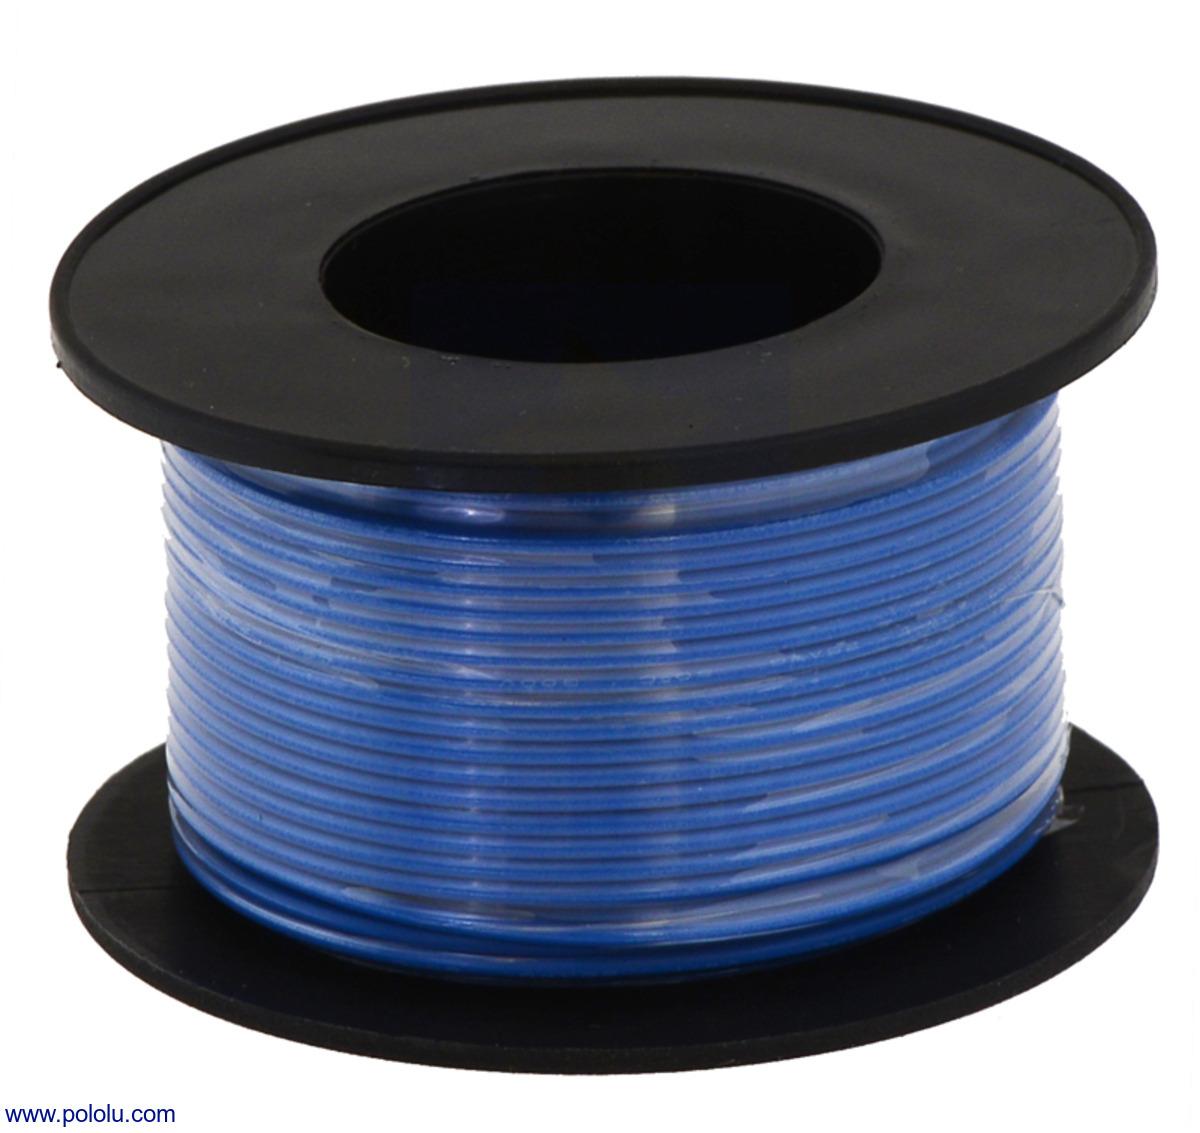 Pololu - Stranded Wire: Blue, 24 AWG, 60 Feet